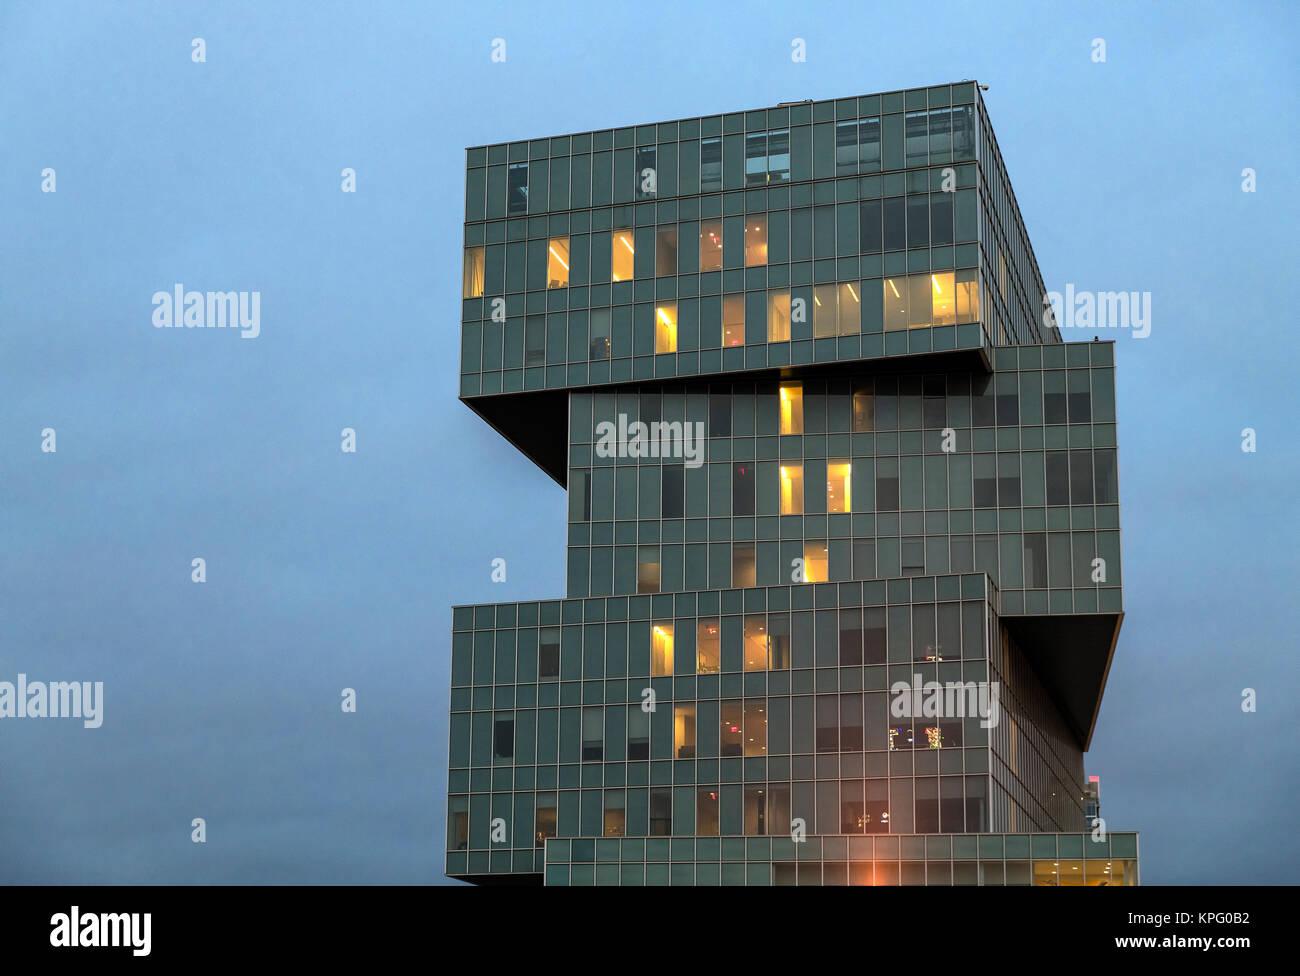 University of North Carolina, Center City Classroom Building, Charlotte, North Carolina, USA. - Stock Image